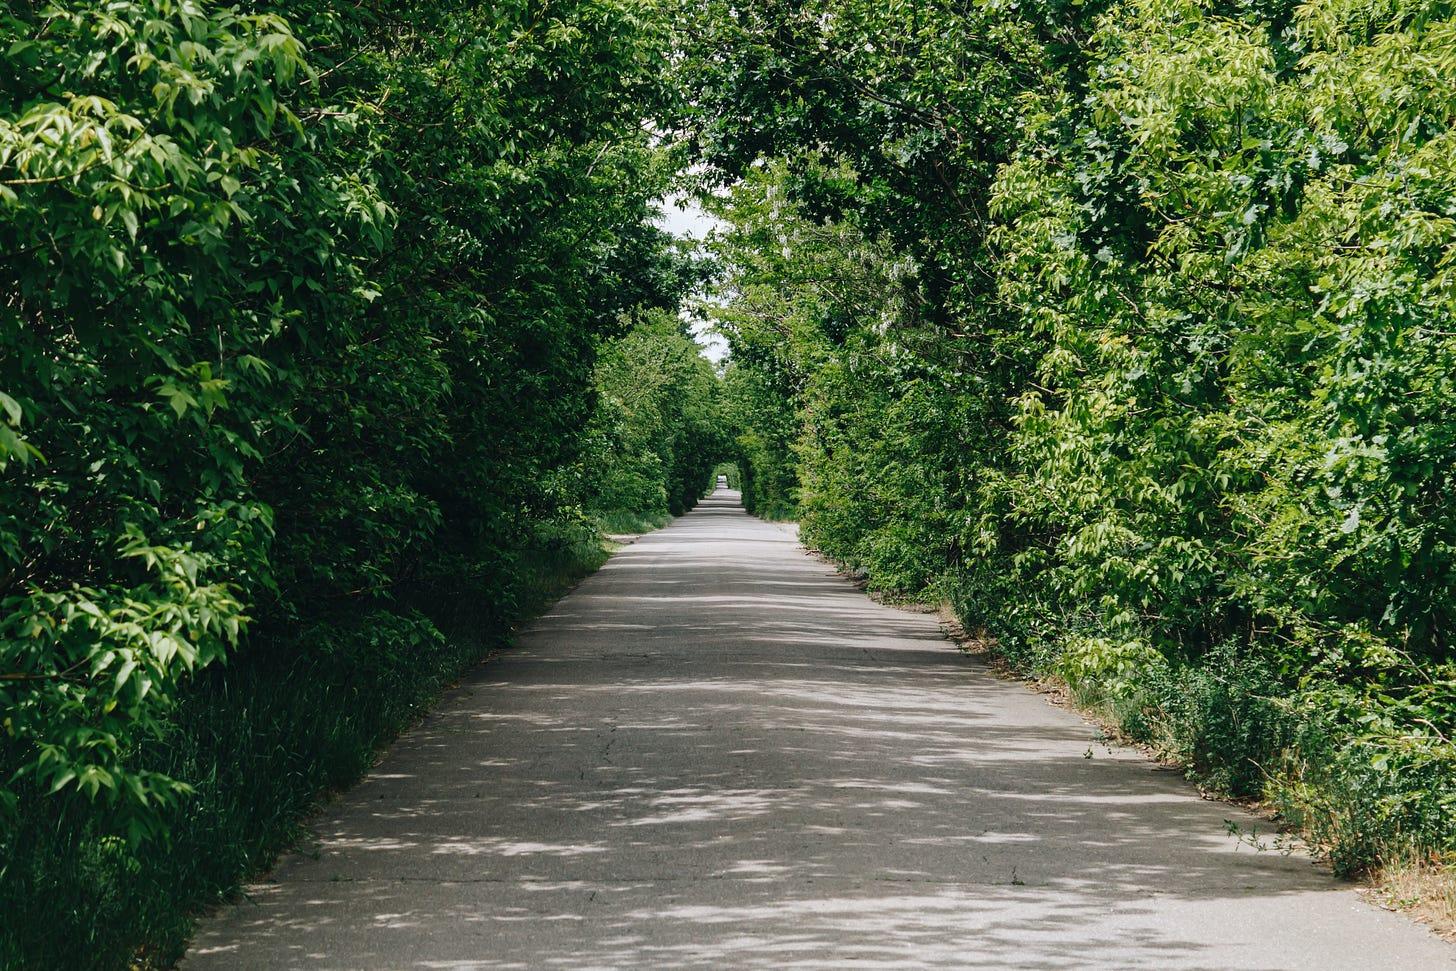 Path through tress